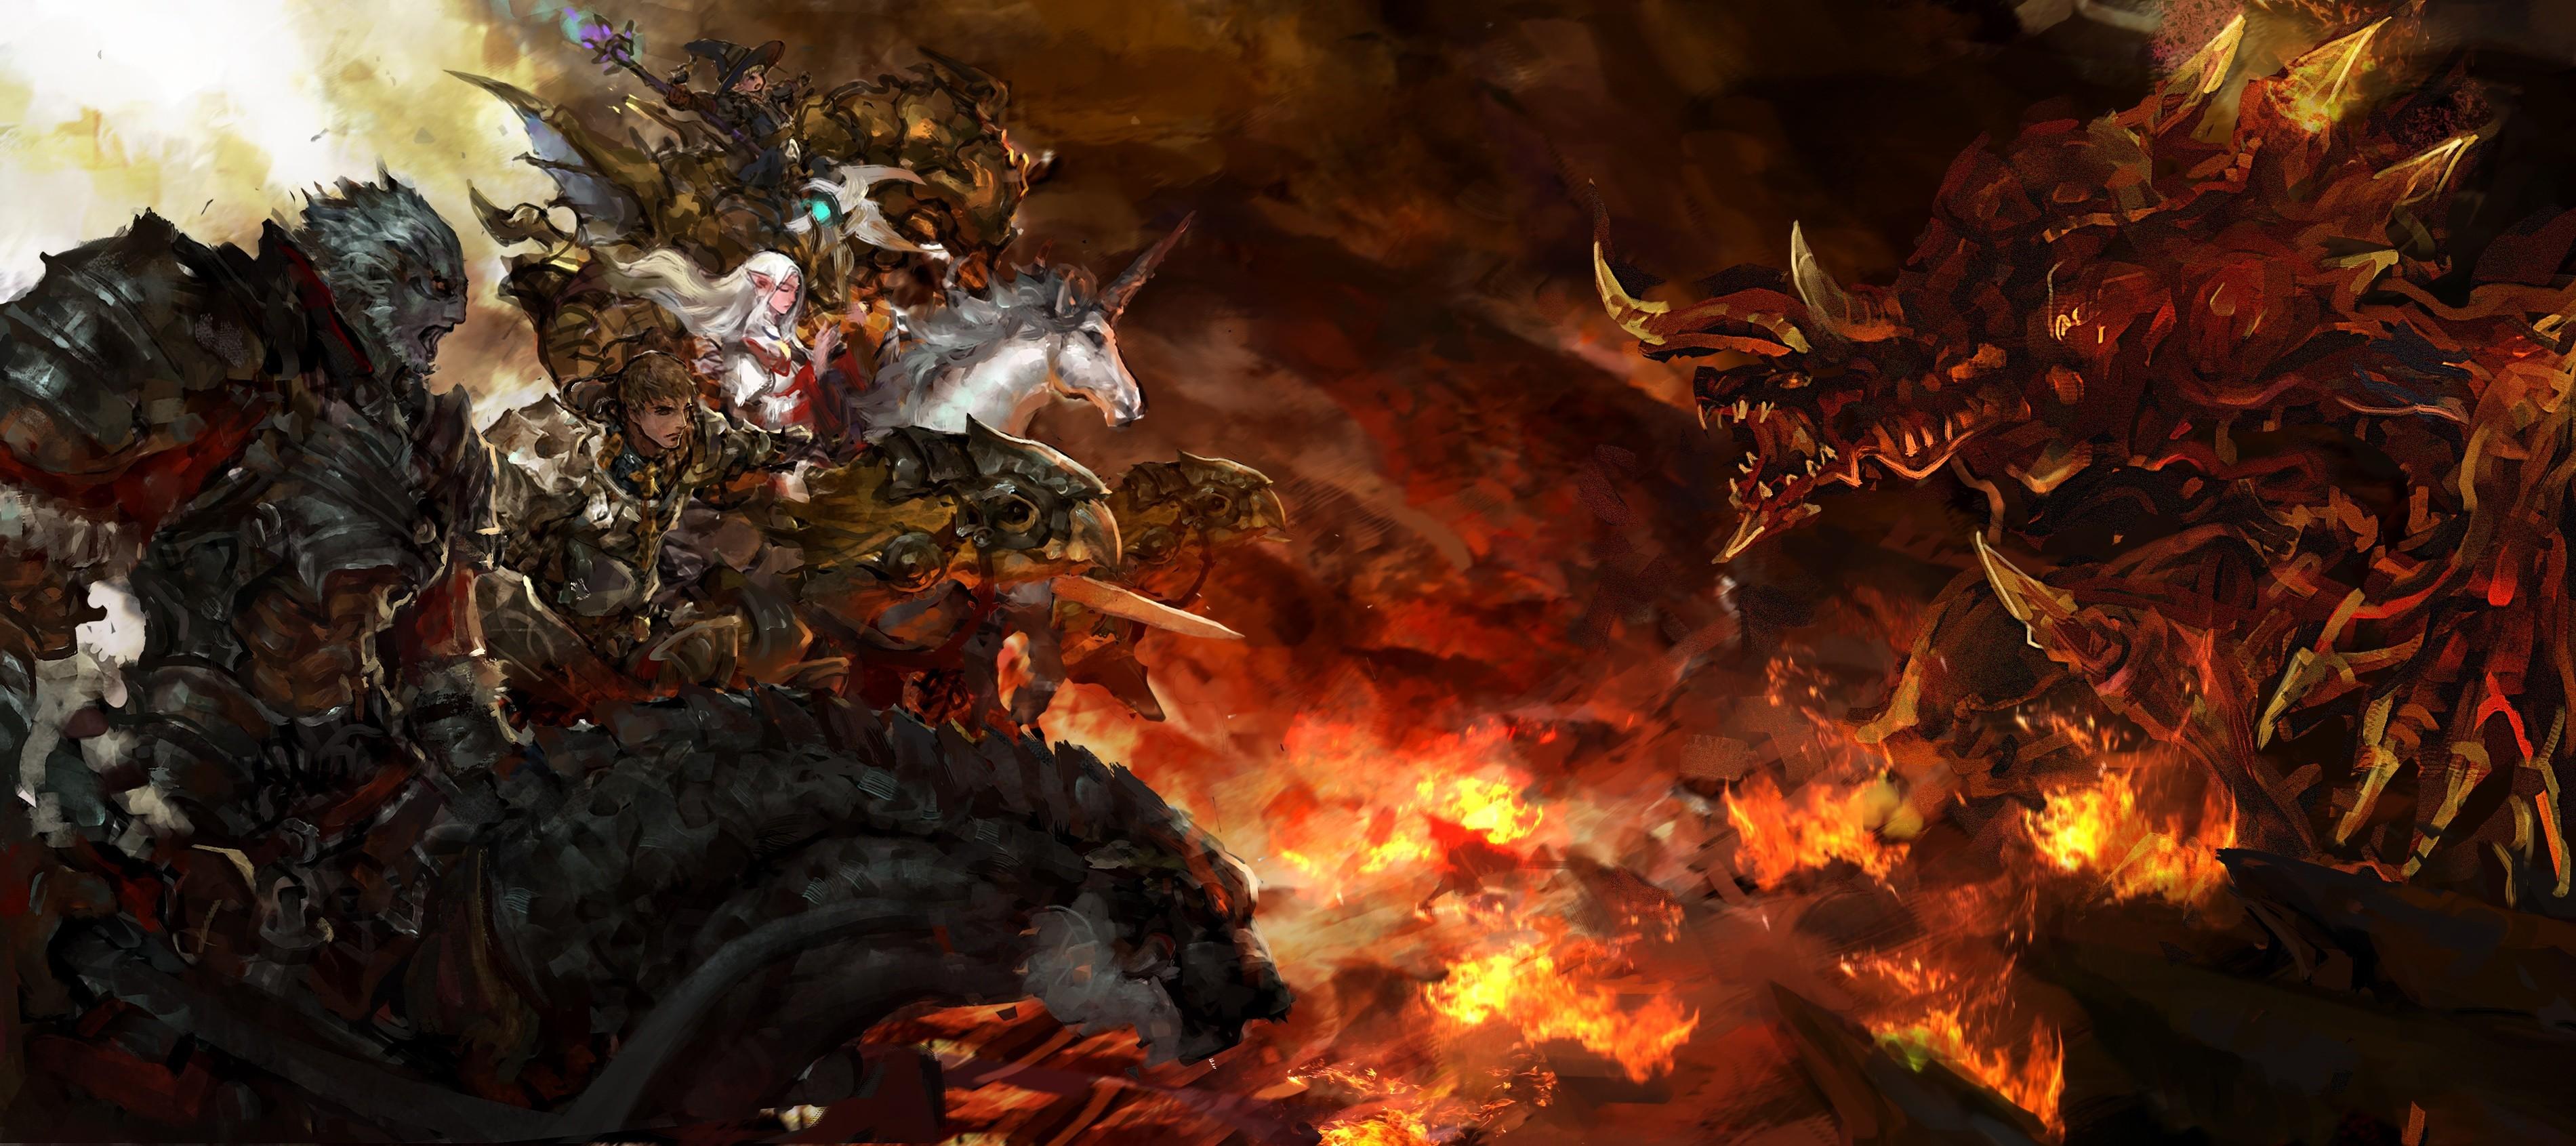 Final Fantasy XIV: A Realm Reborn Fanart: Ifrit and Odin – 2P.com